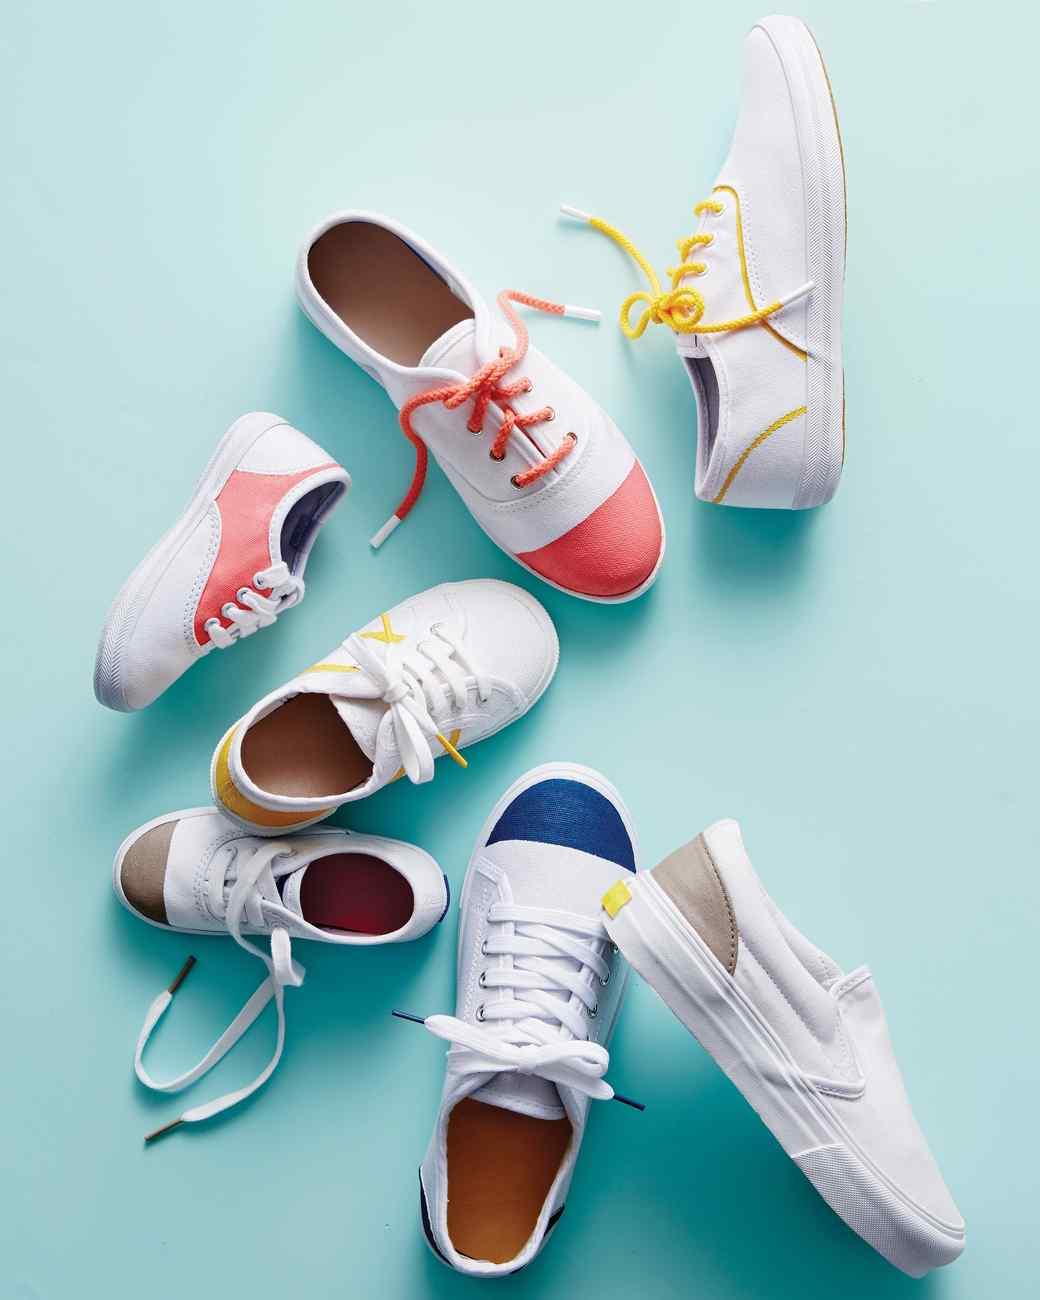 diy-sneakers-redo-001-d112713.jpg